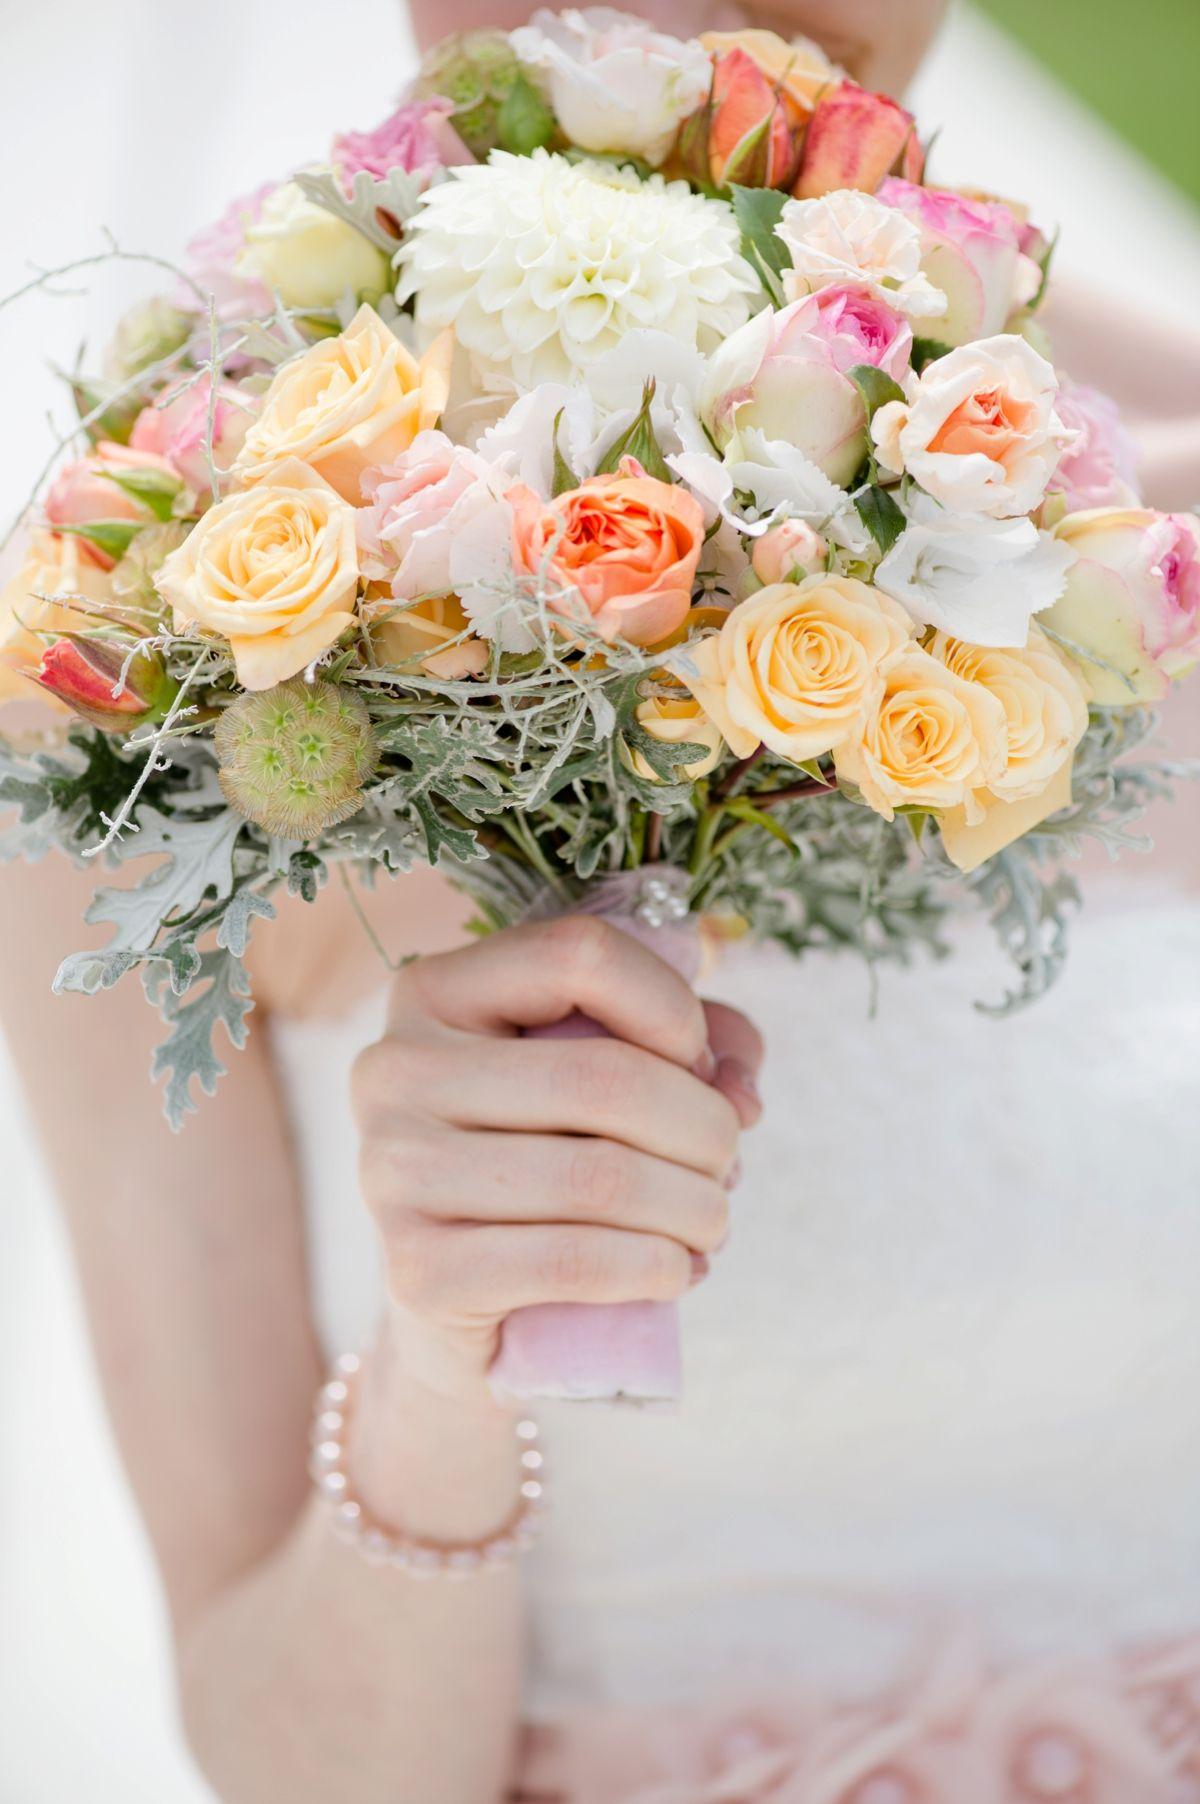 Brautstrau Brkle Grtnerei wedding bouquet flowers